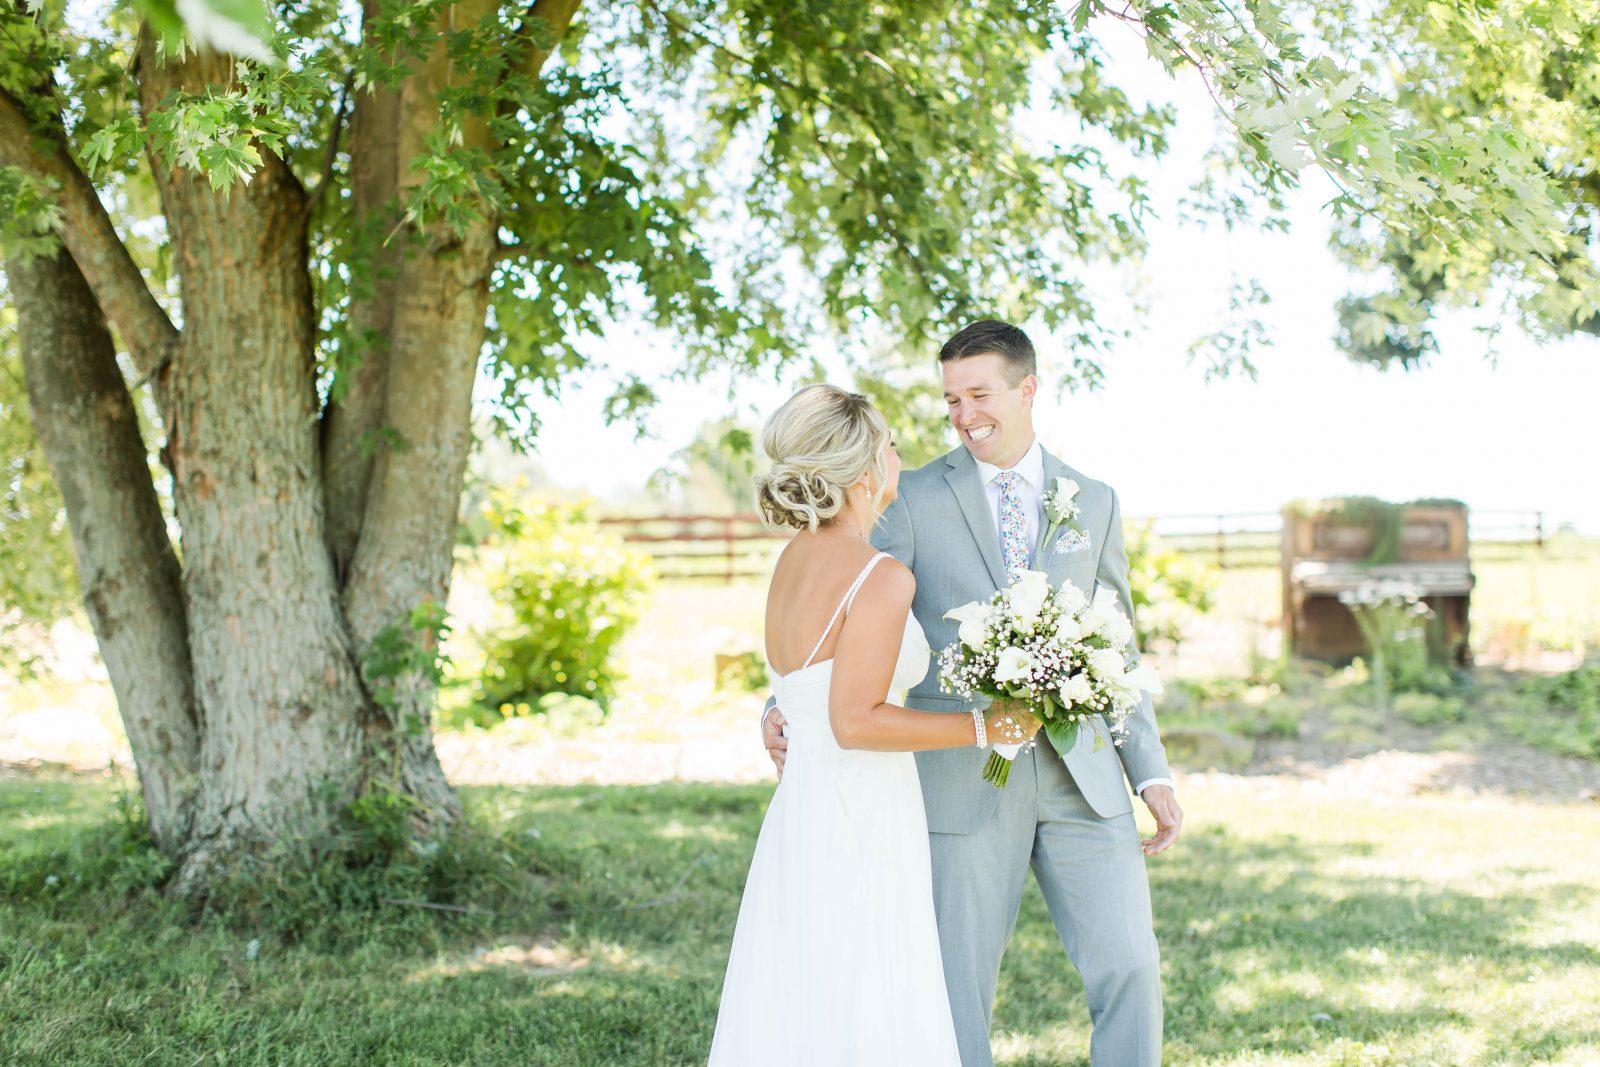 peacock-ridge-summer-wedding-photographer-akron-ohio-loren-jackson-photography-26